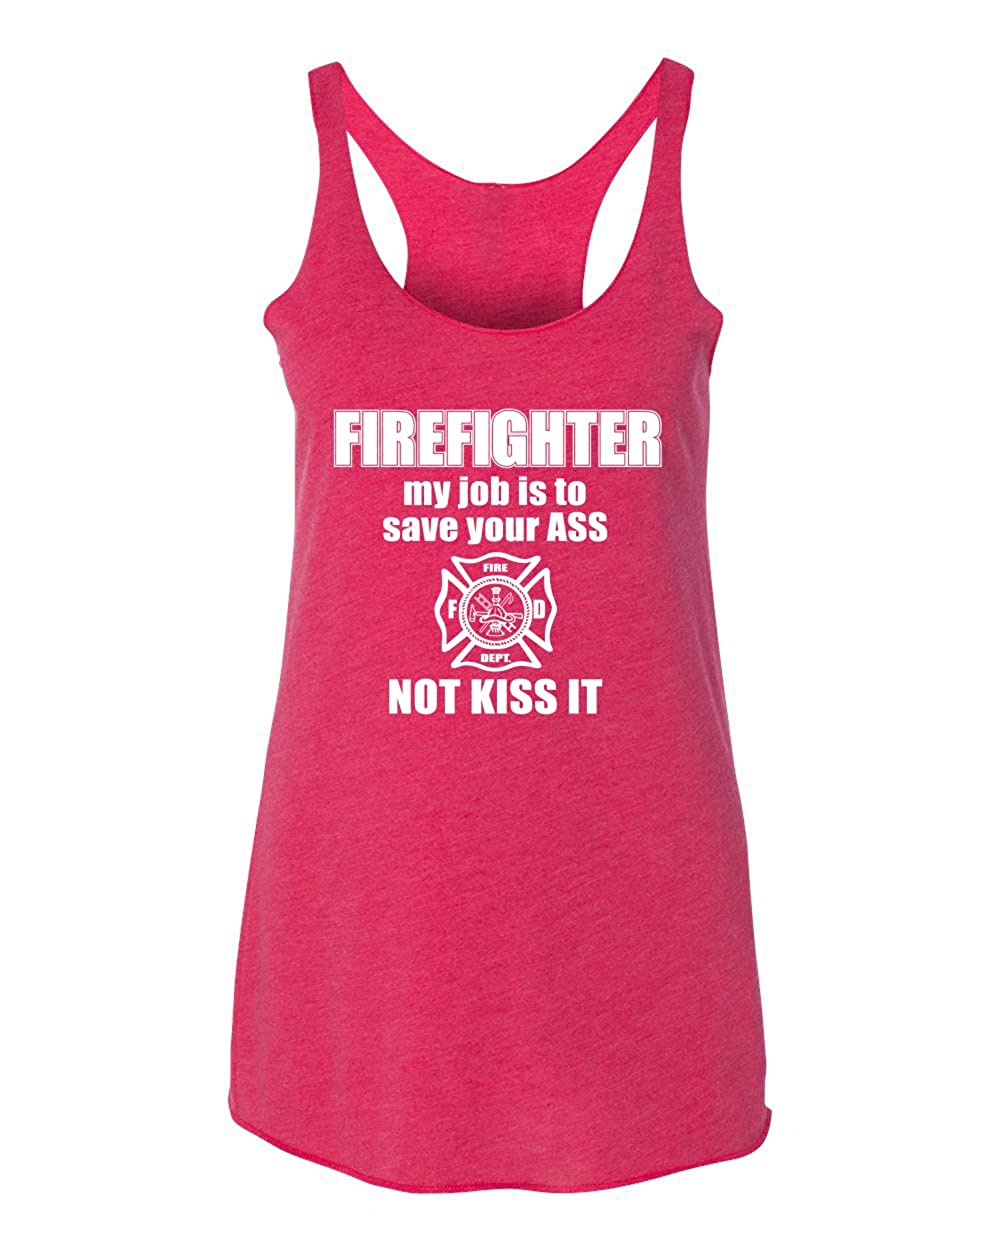 Save Your Ass Not Kiss It Wild Bobby Firefigher Womens Humor Premium Tri-Blend Racerback Tank Top Medium Shocking Pink